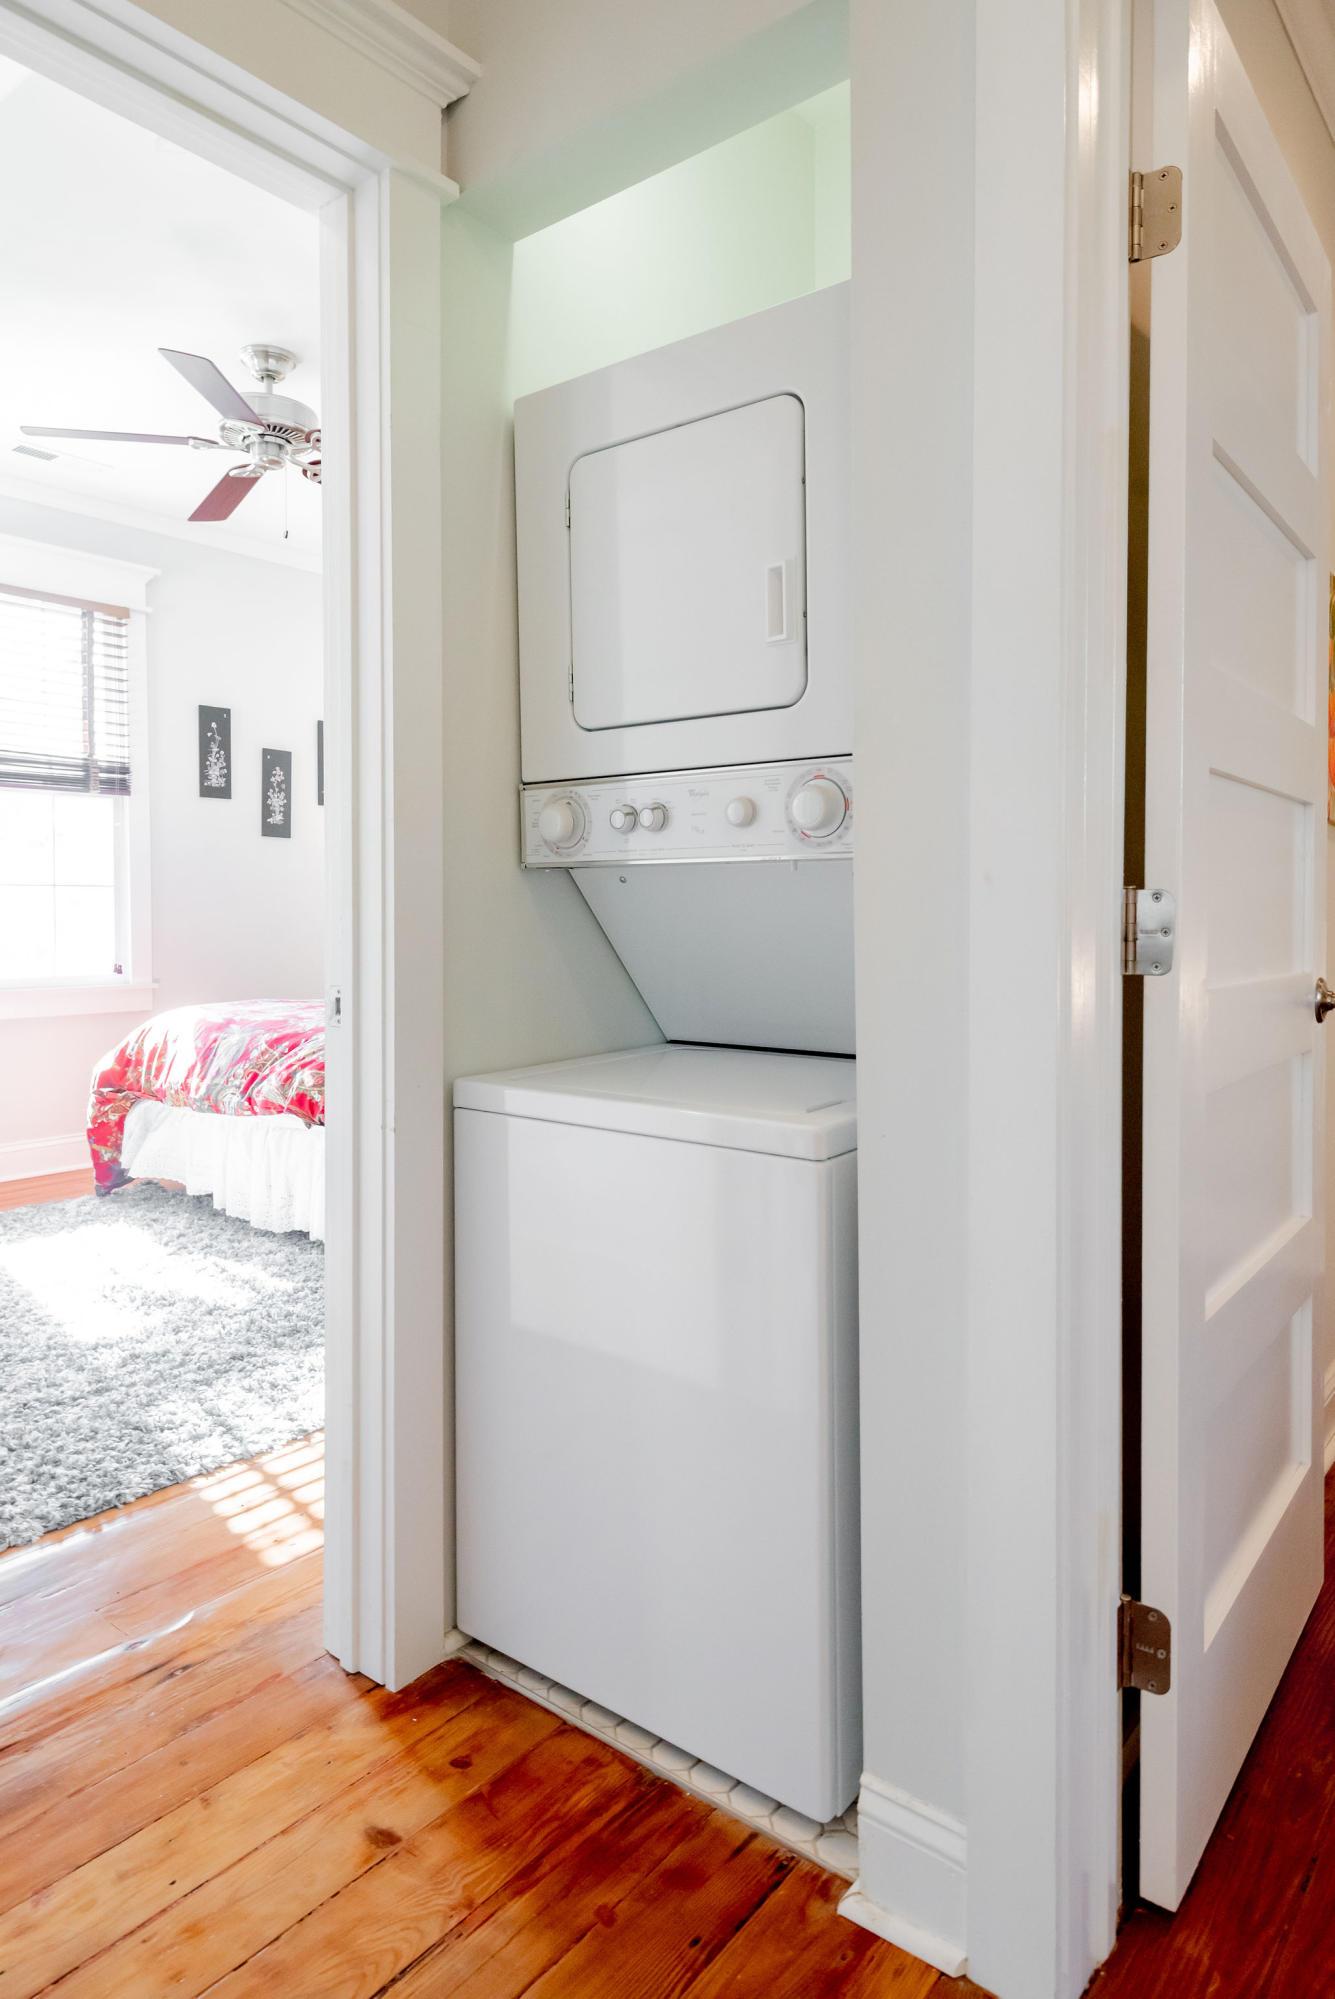 Elliotborough Homes For Sale - 29 Sires, Charleston, SC - 2